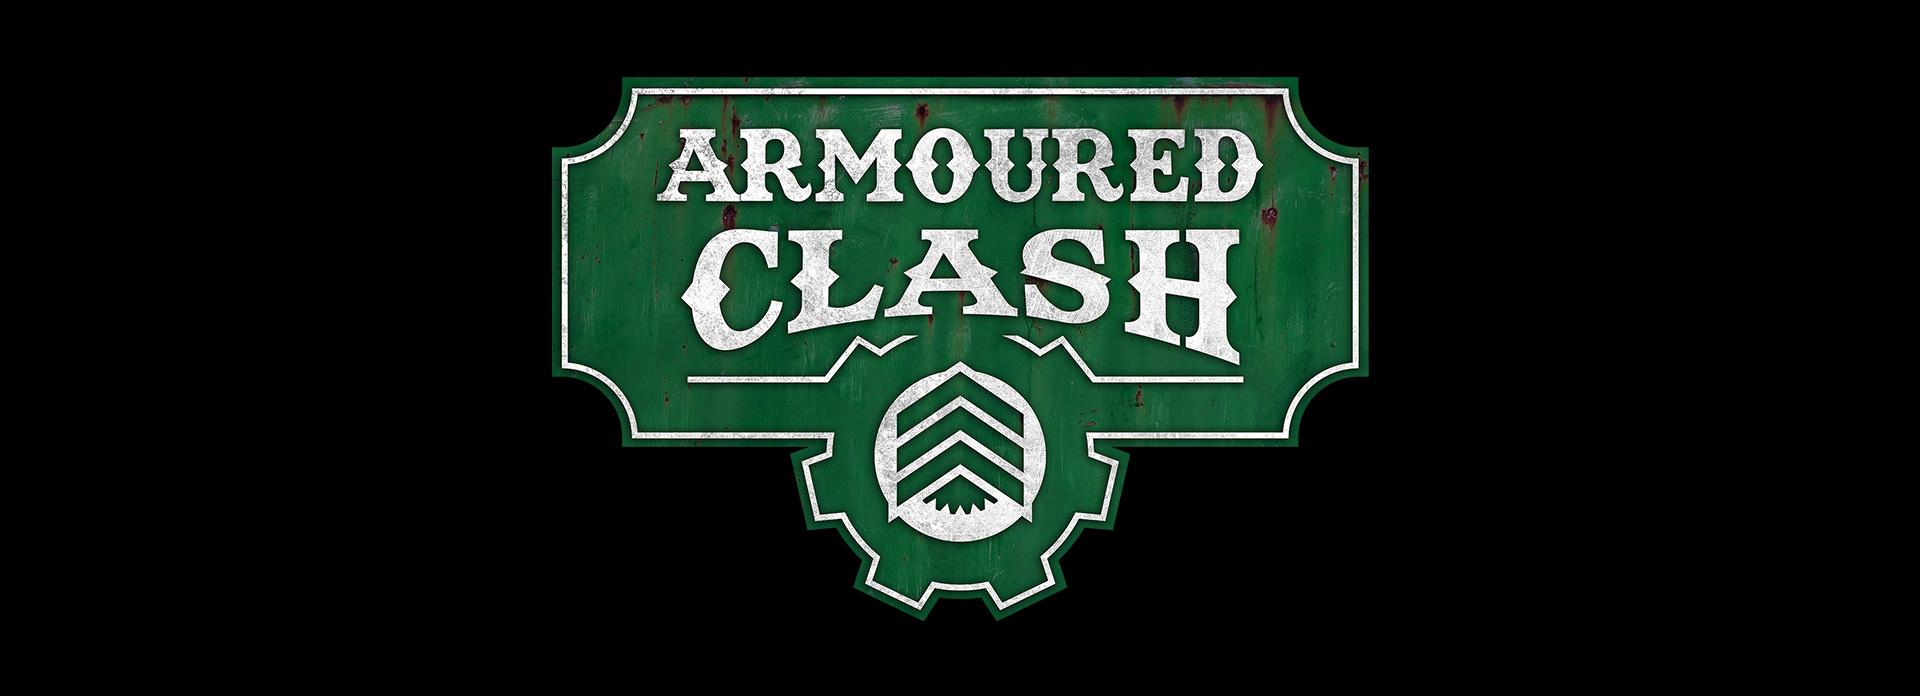 Video Screens_Title Armoured Clash.jpg